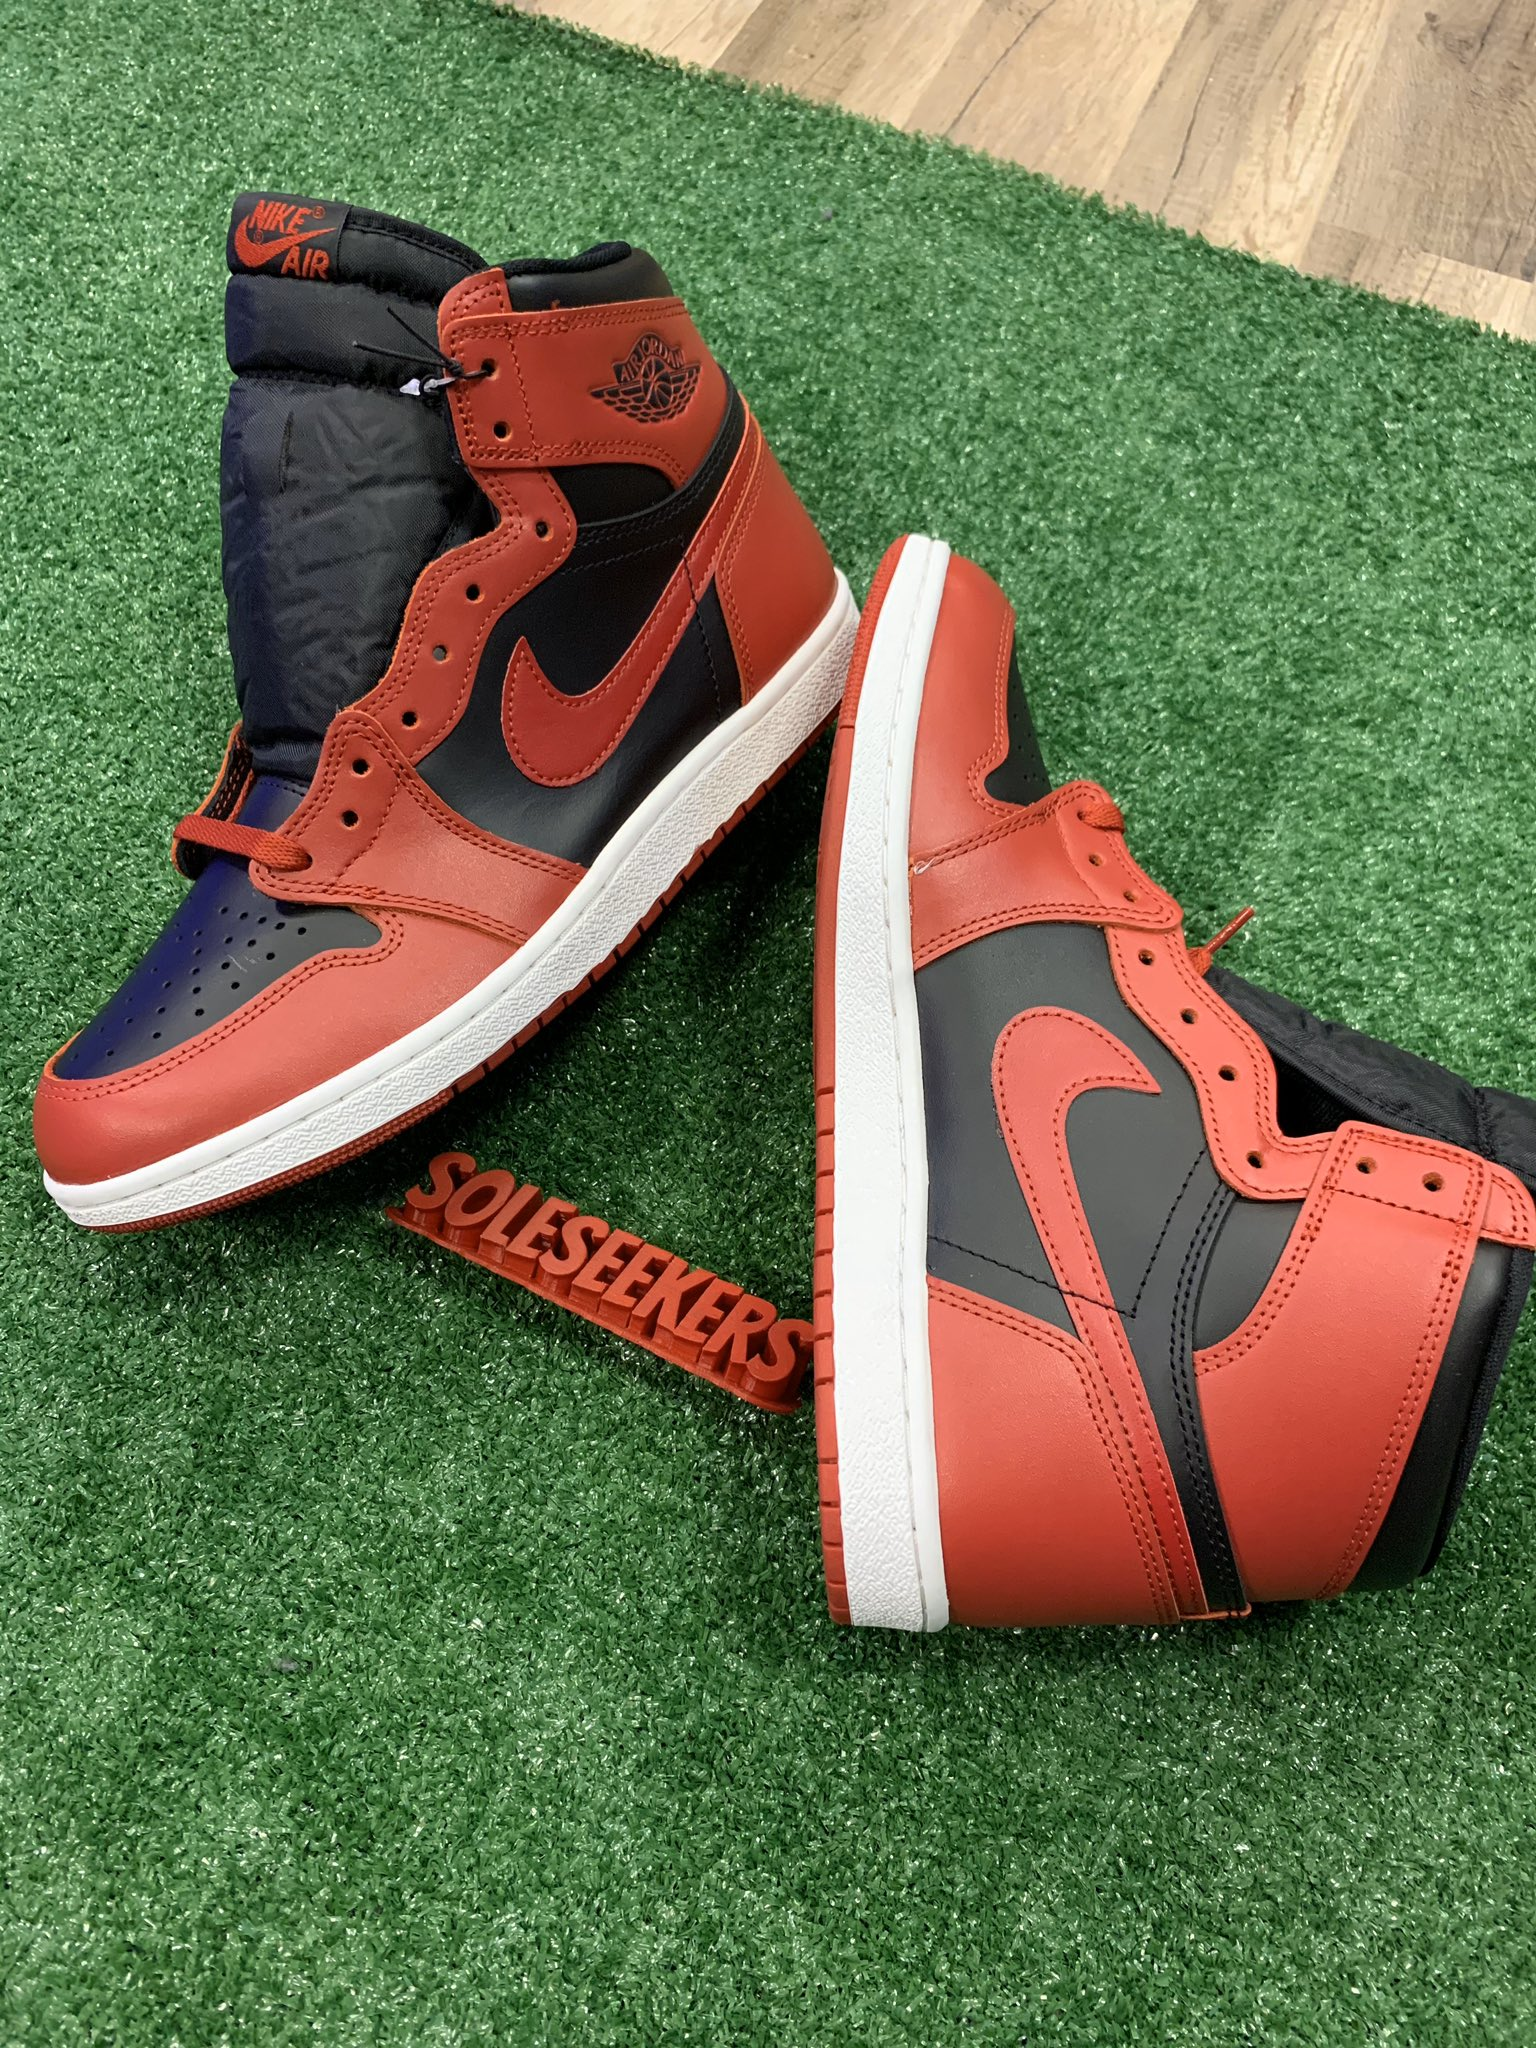 First Look: Air Jordan 1 High 85 'Varsity Red/Black'